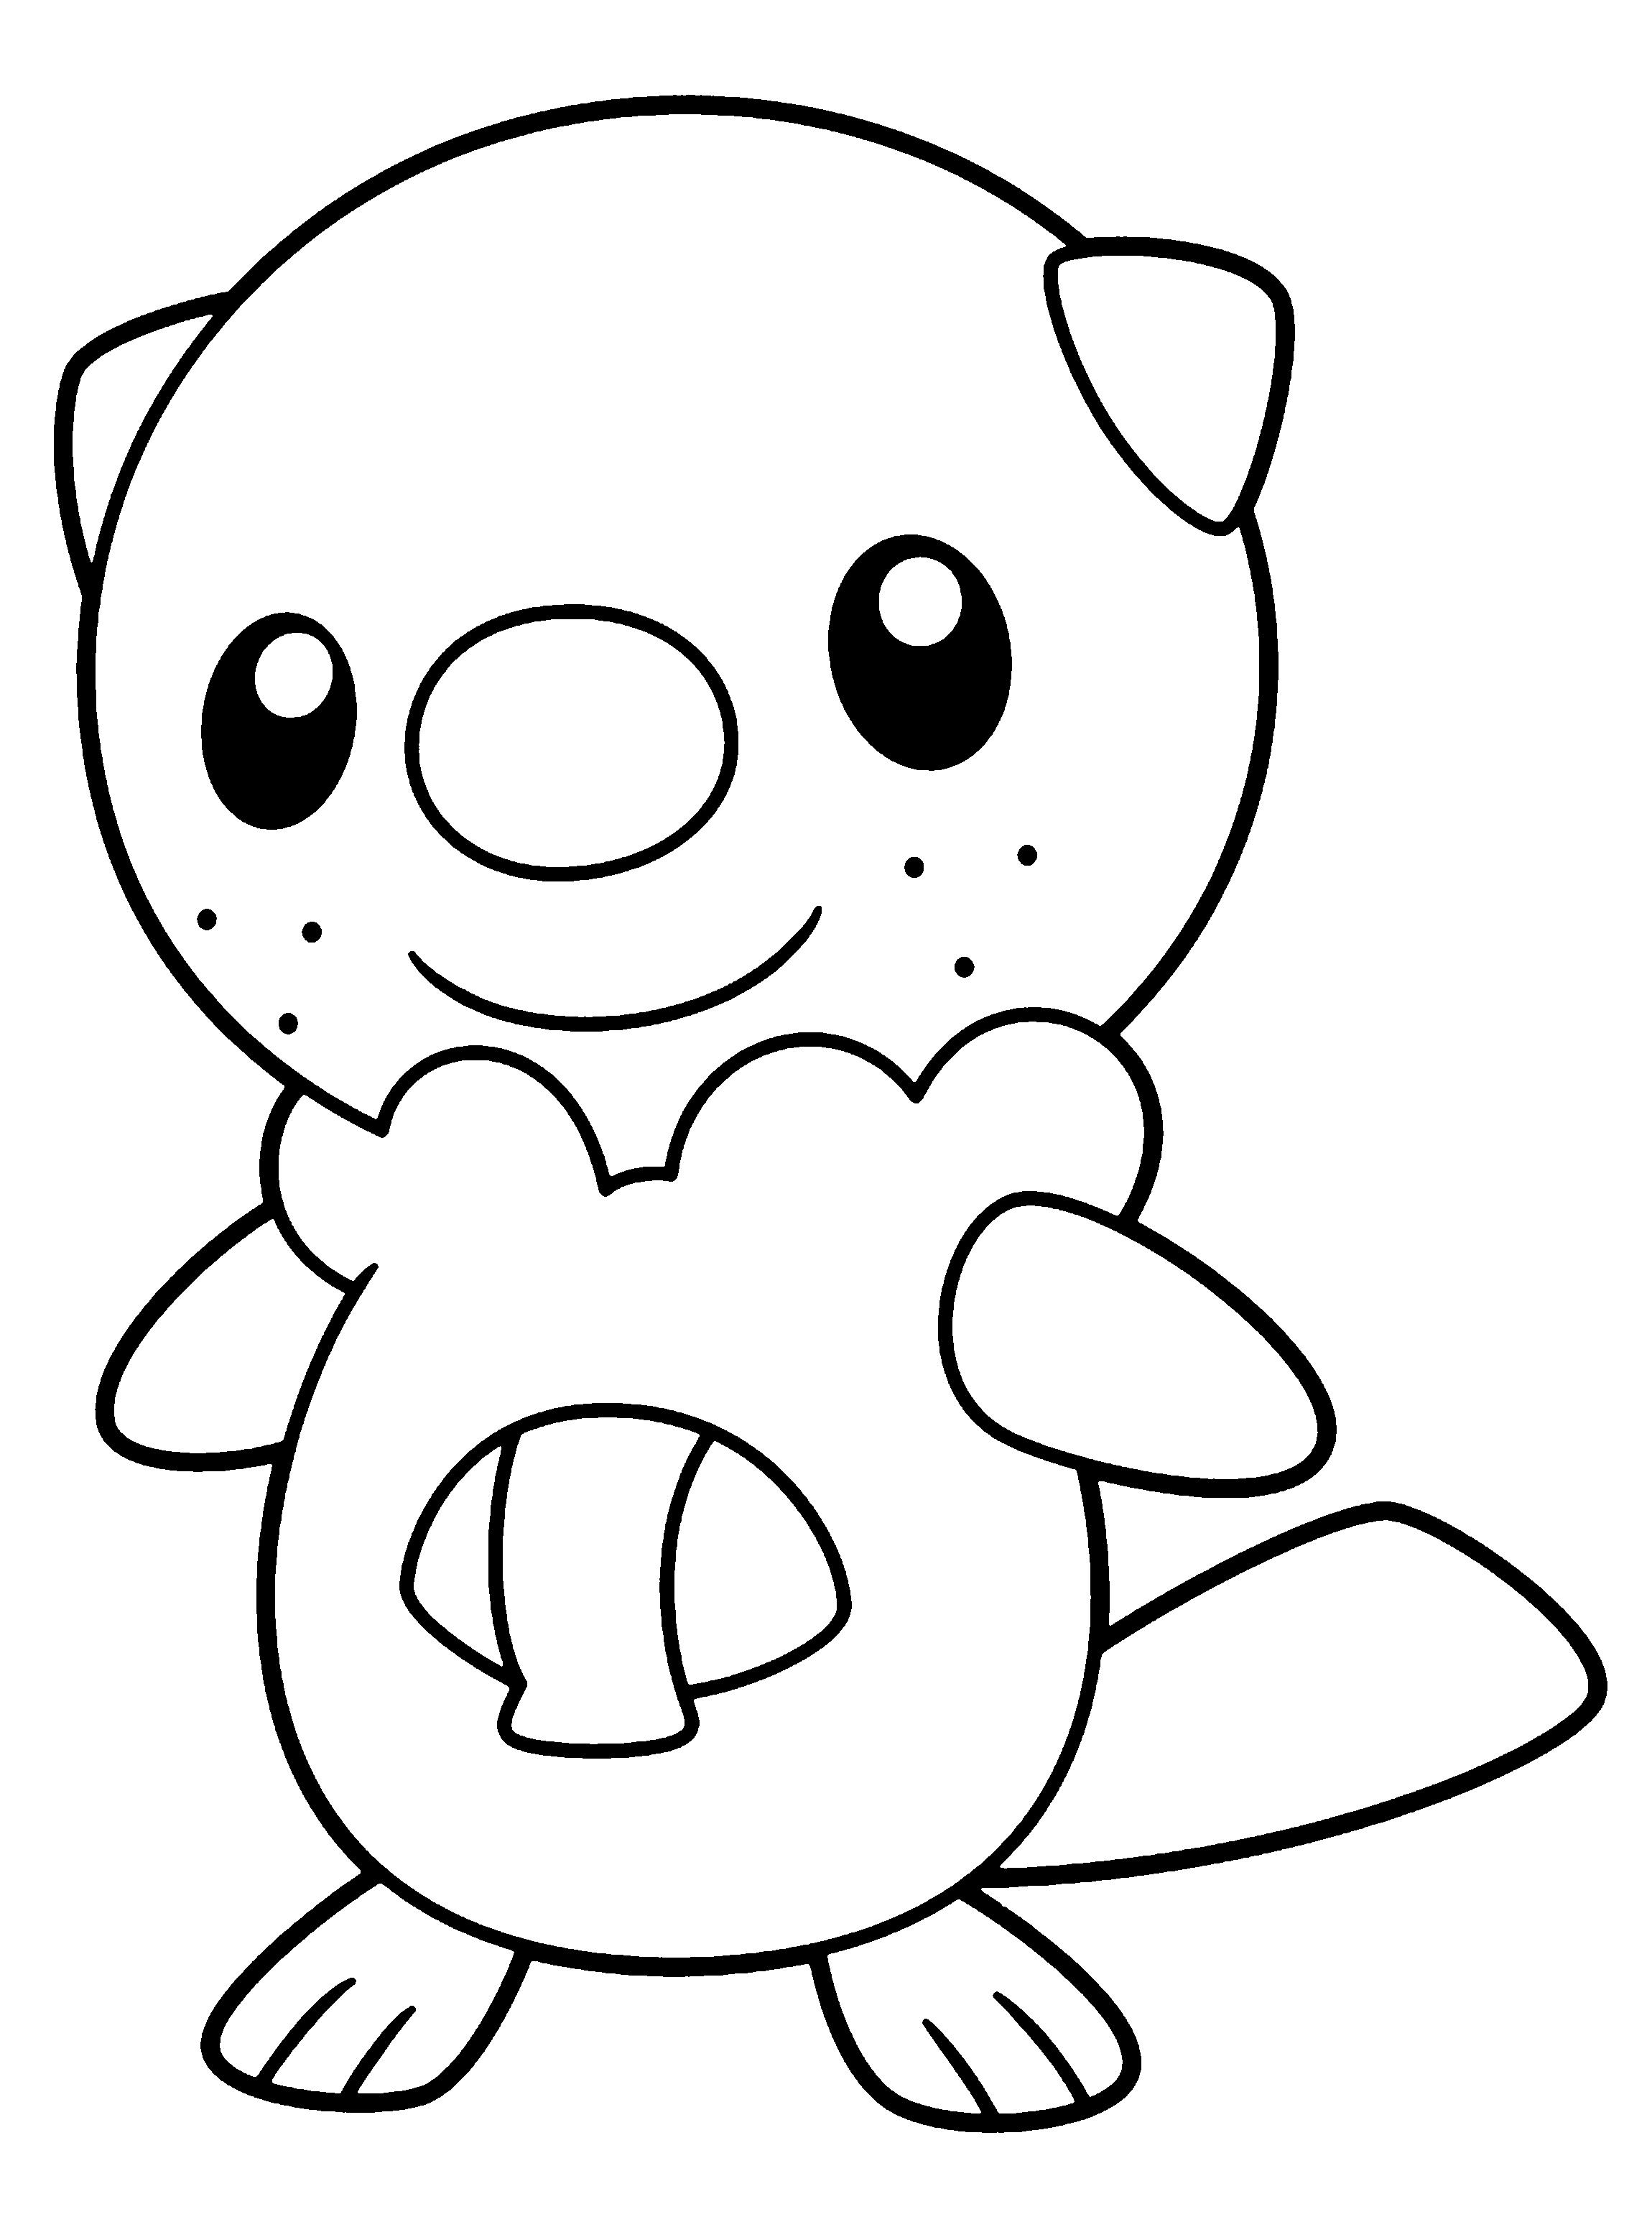 2300x3100 Pokemon Black And White Drawing Pokemon Black And White Coloring